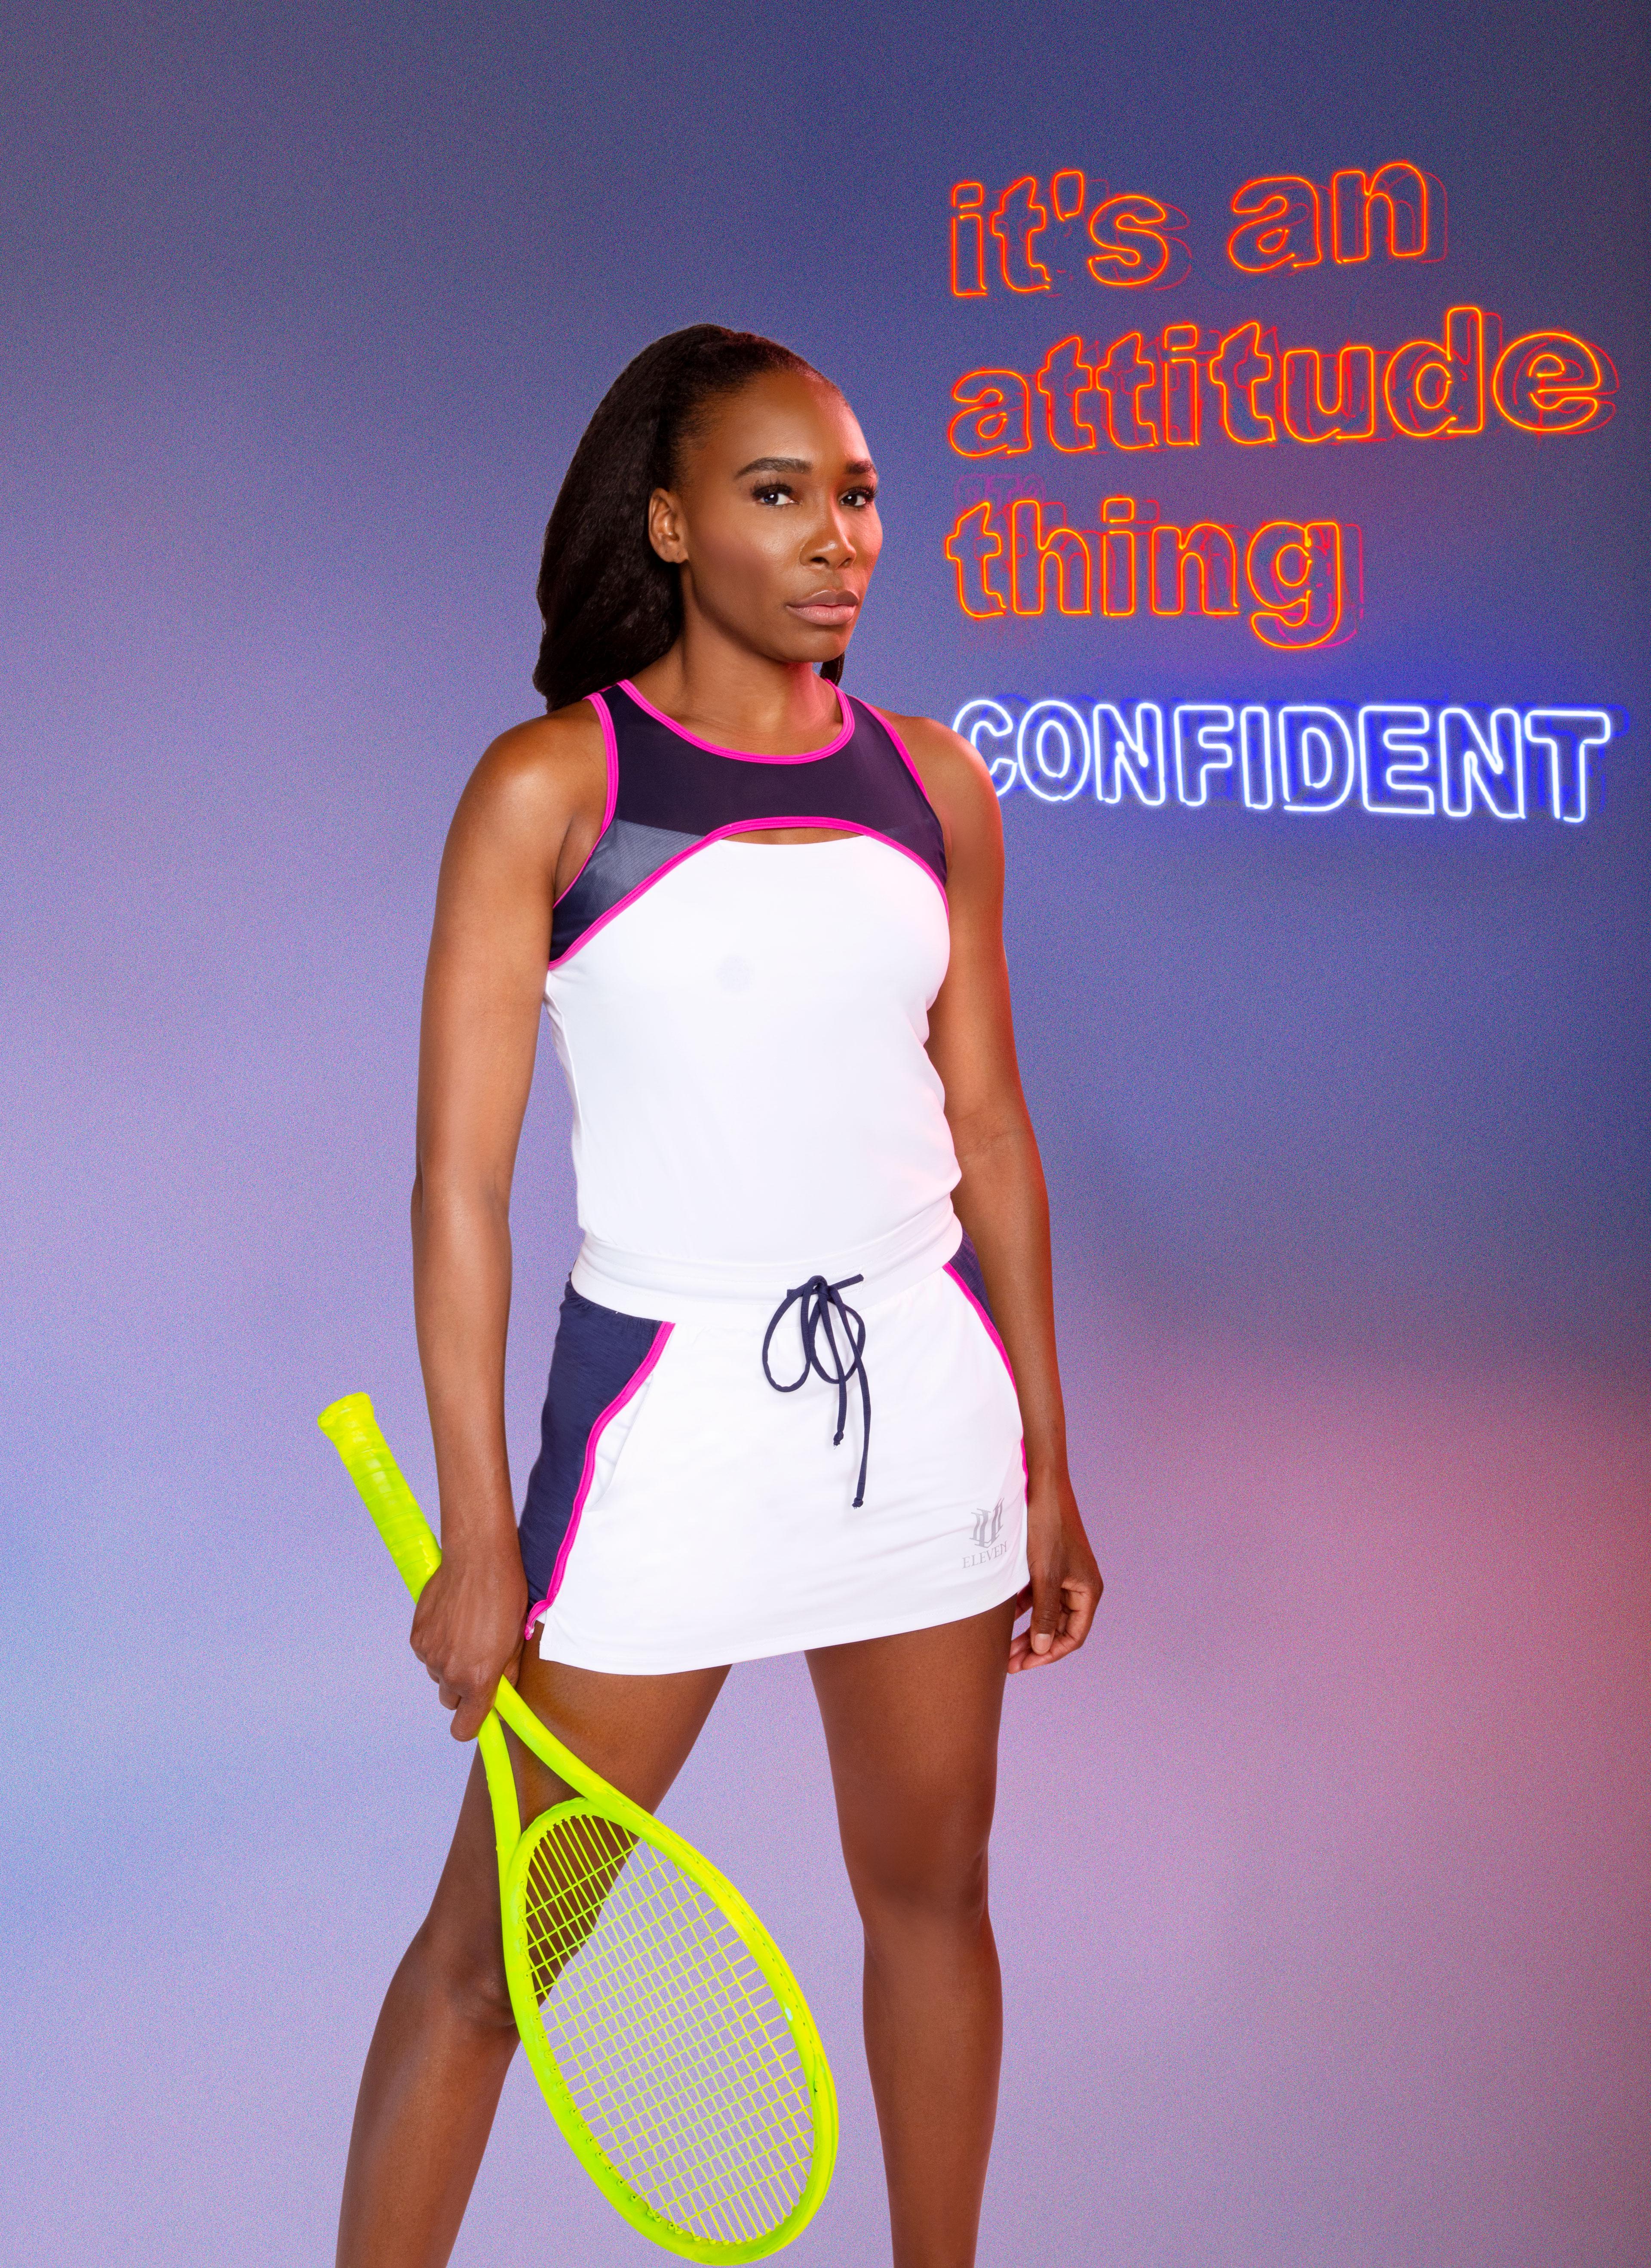 Venus Williams activewear line Australian Open